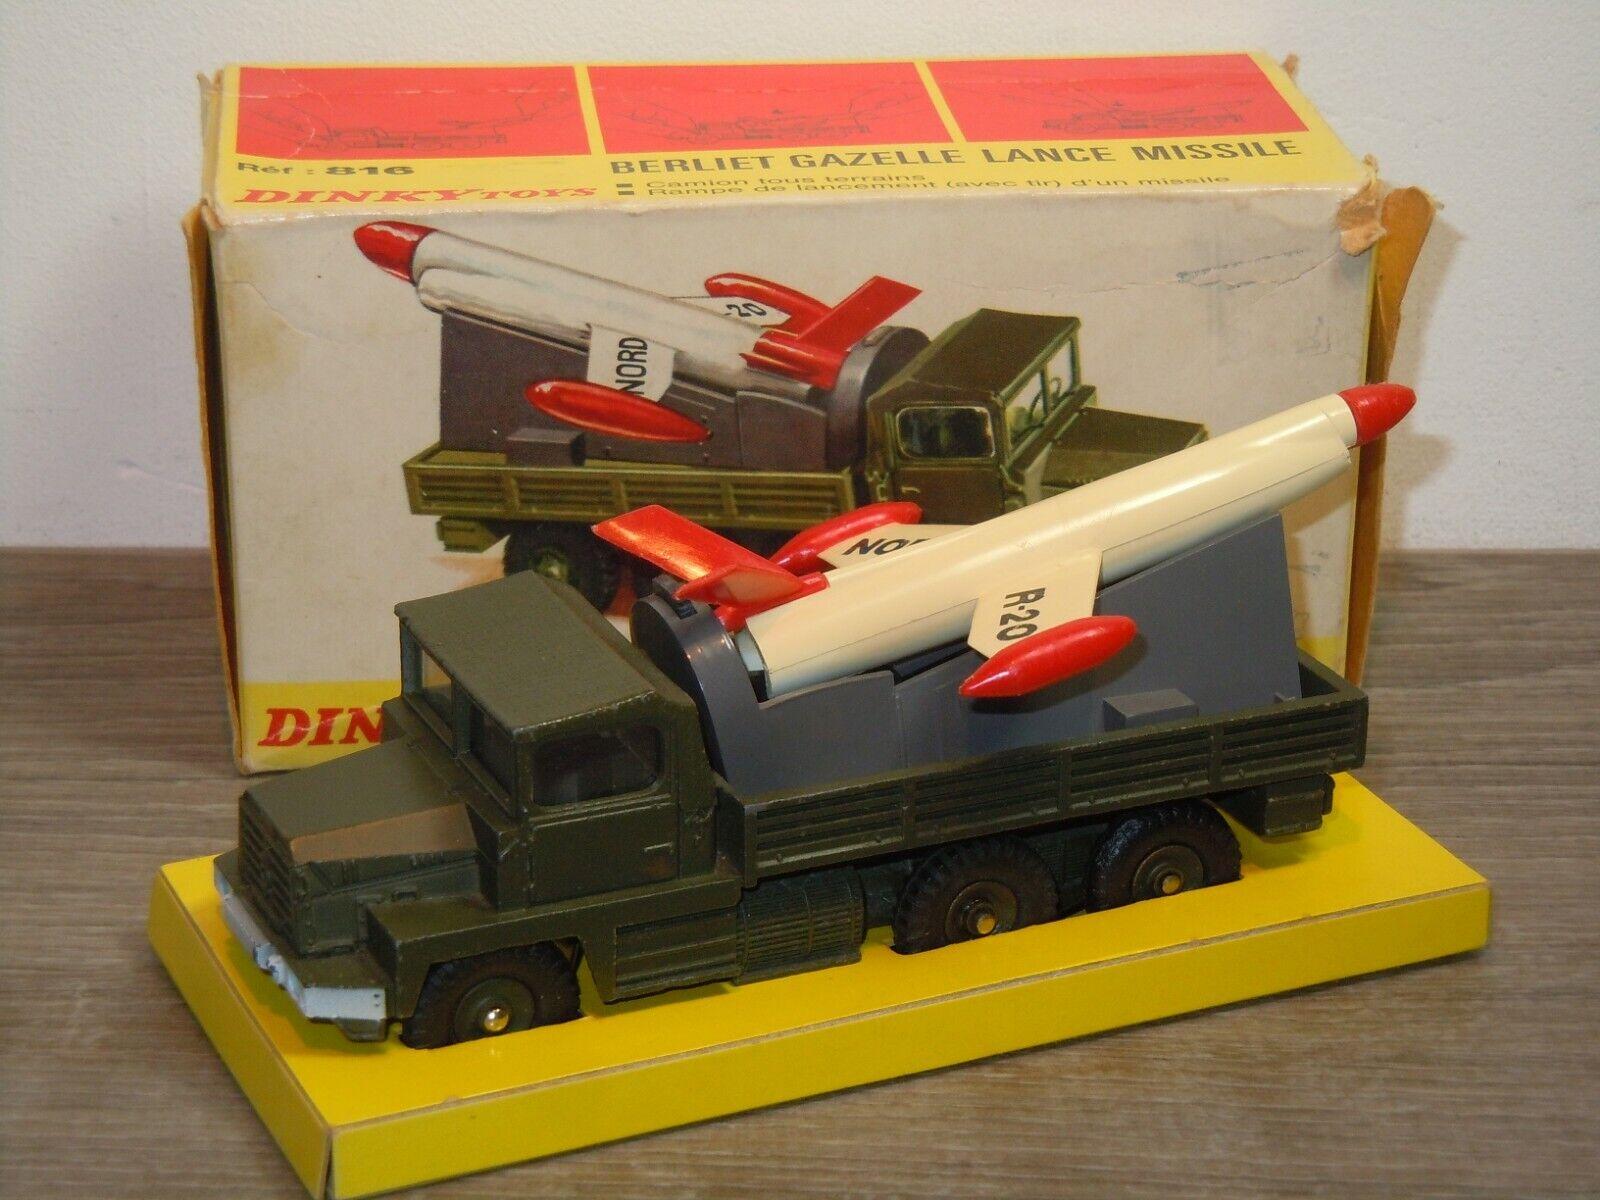 Berliet Gazelle Lance Missile - Dinky Toys 816 France in Box 37593